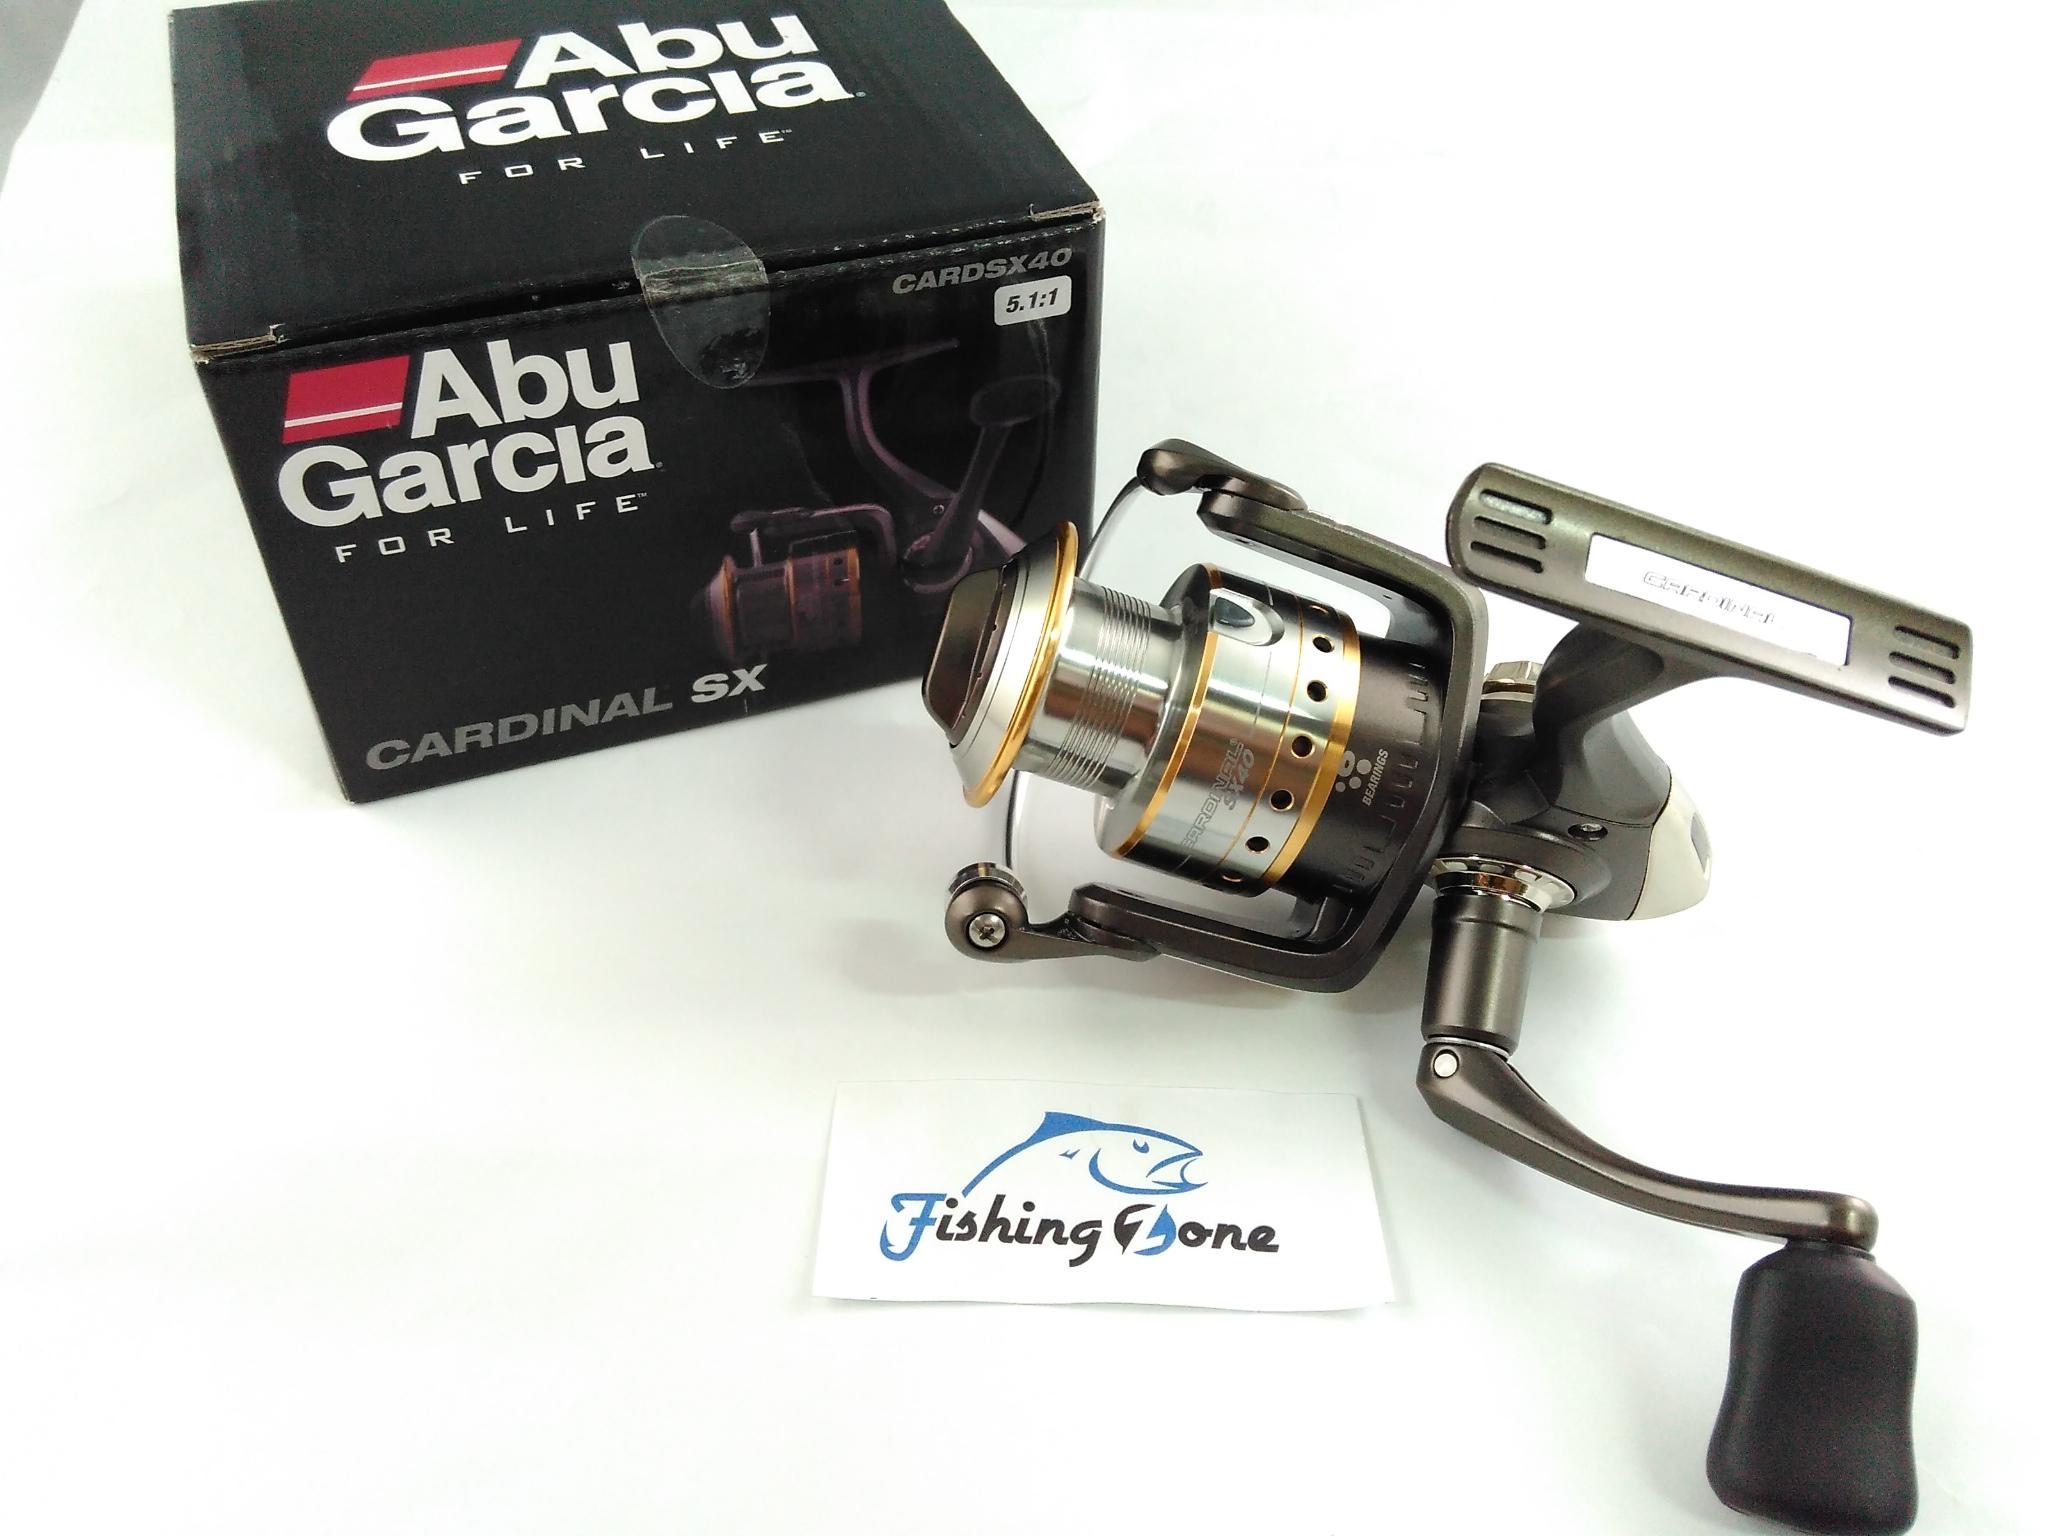 harga Alat Pancing Abu Garcia Cardinal Sx 5 Spinning Reel Blanja.com